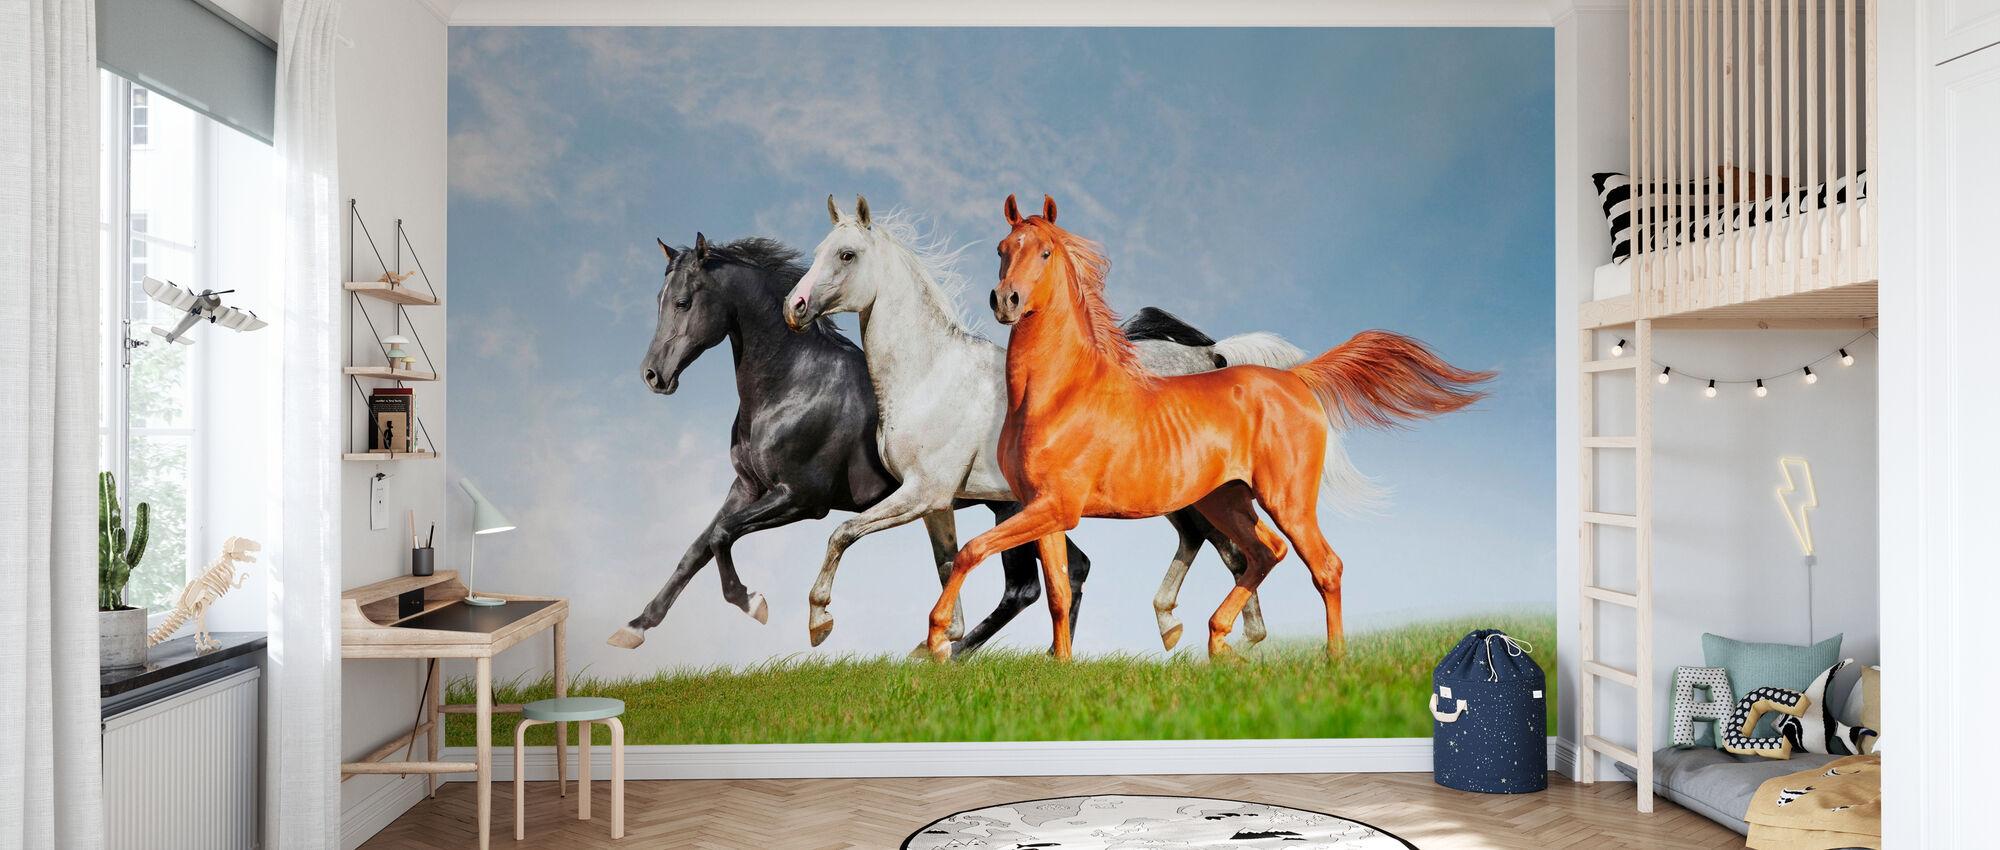 Arab Horses Run Free - Wallpaper - Kids Room